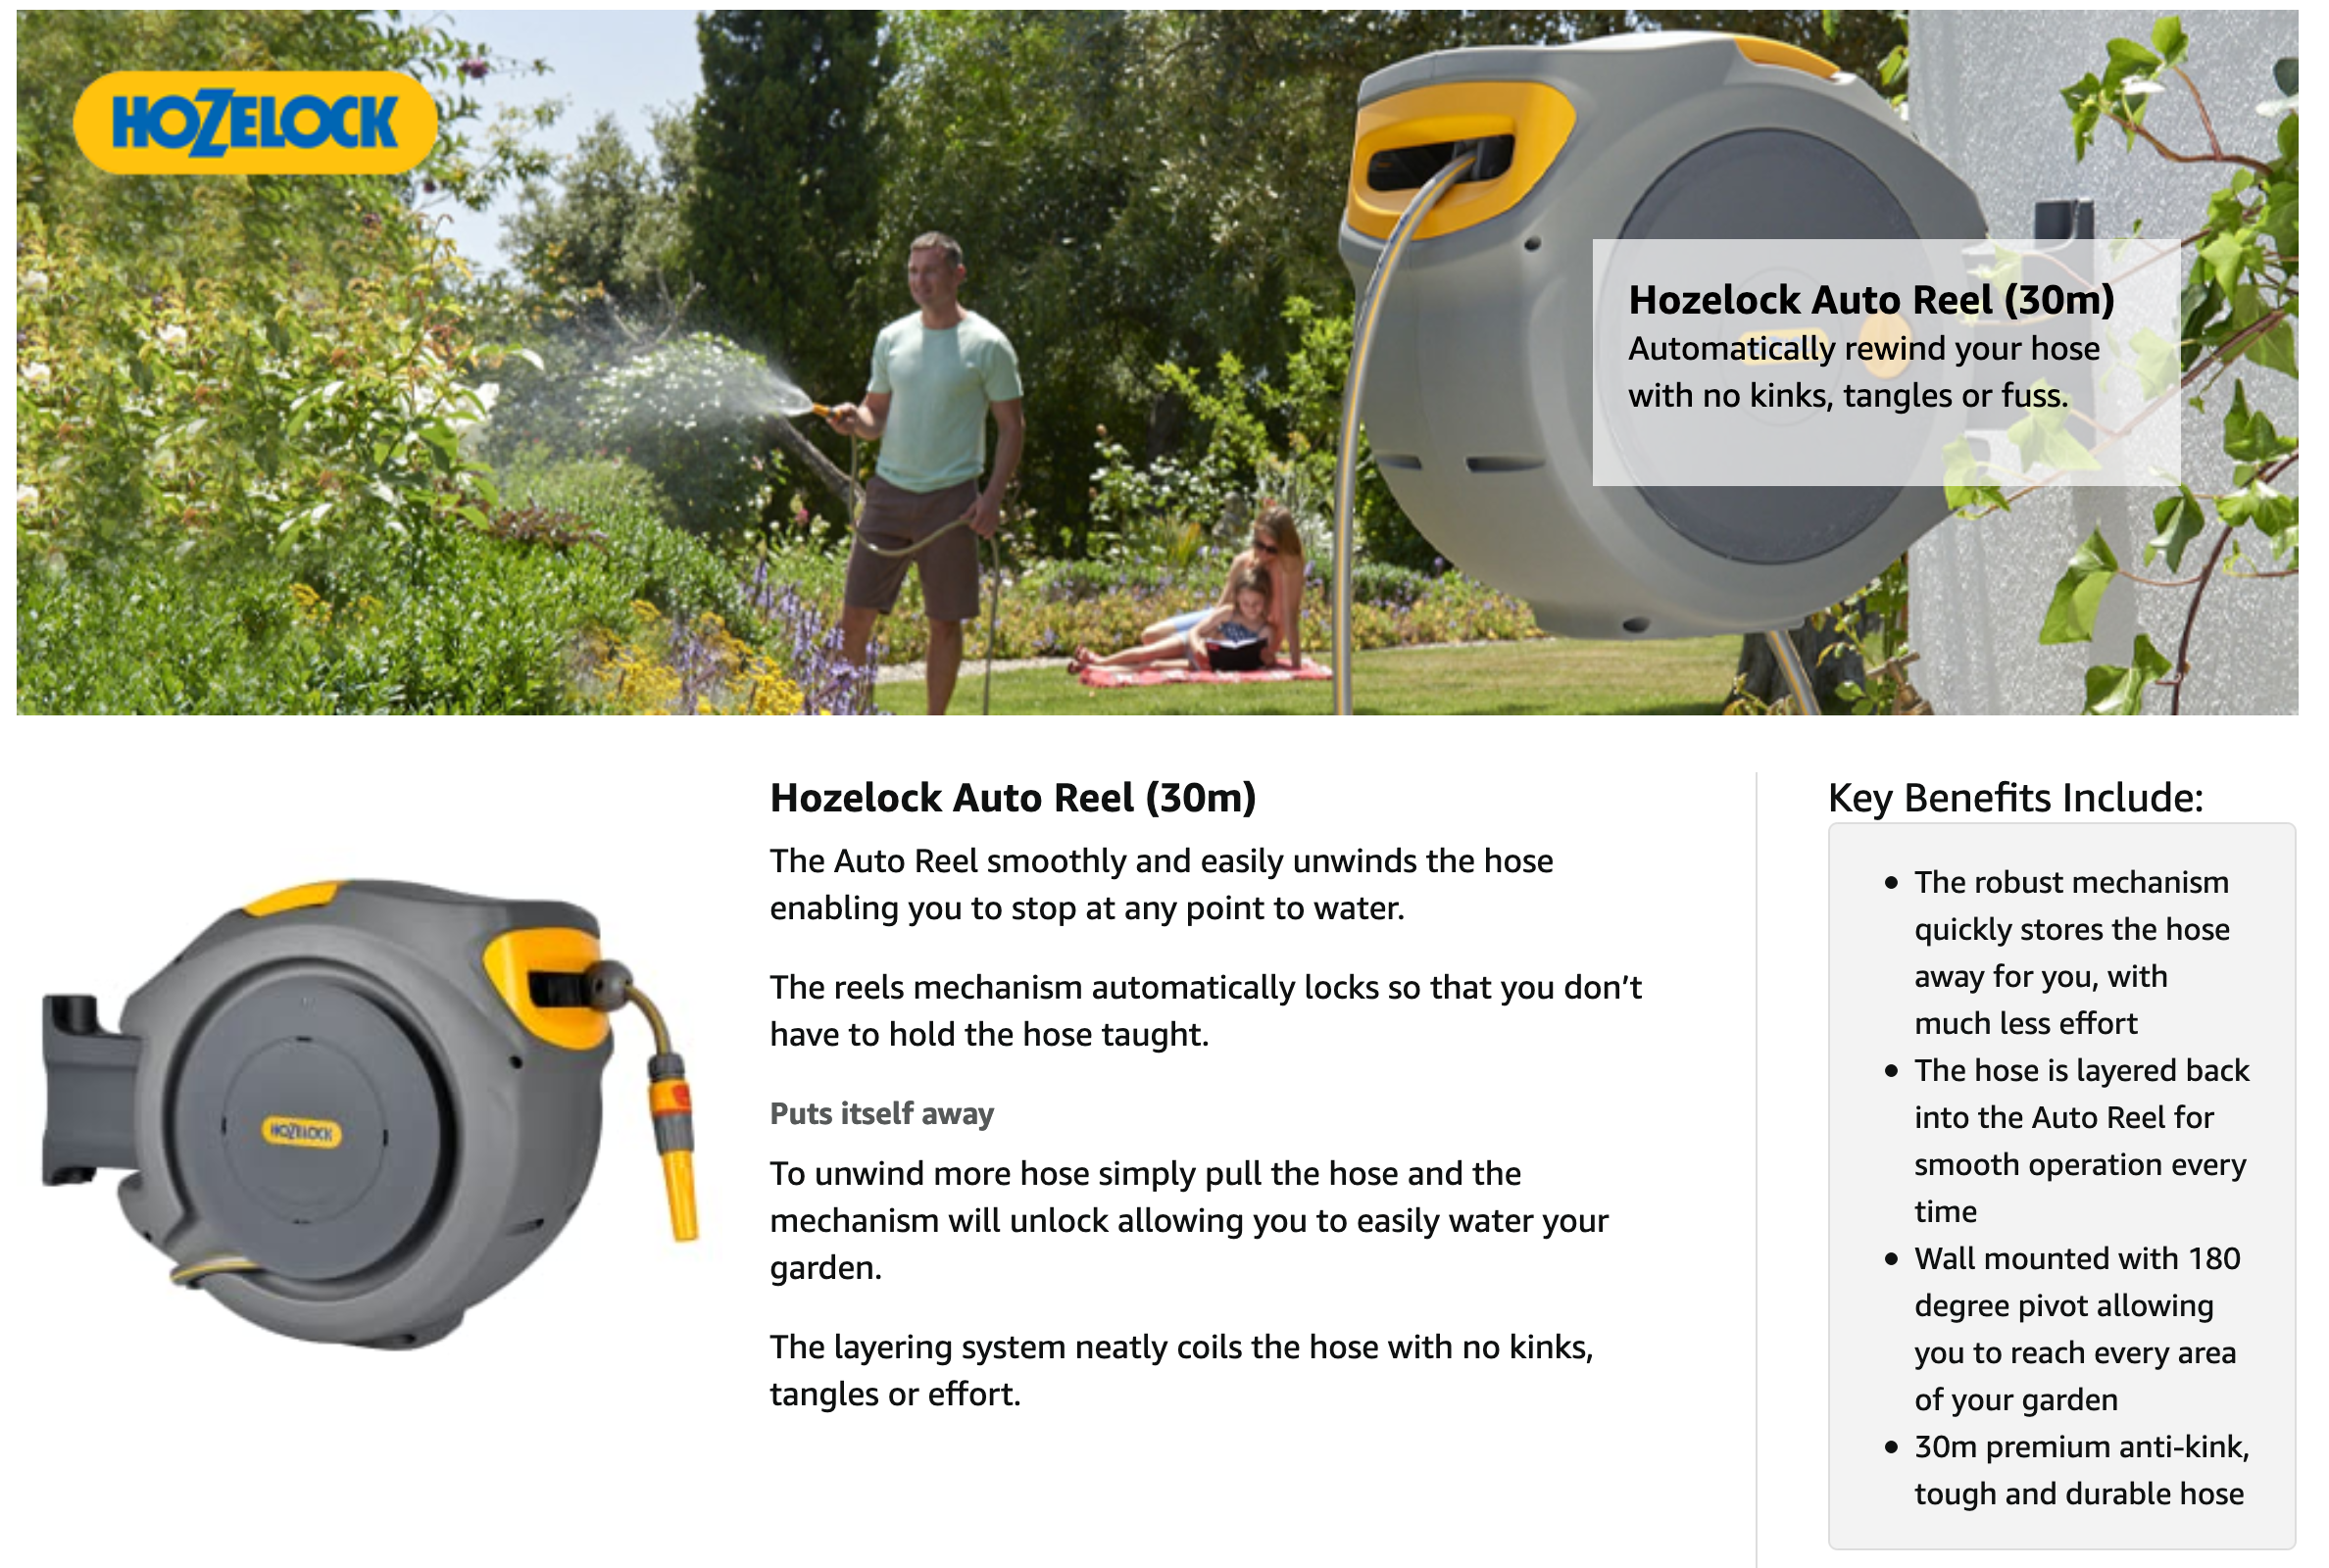 hozelock-2403-30m-autoreel-fixthebog.uk-d.png